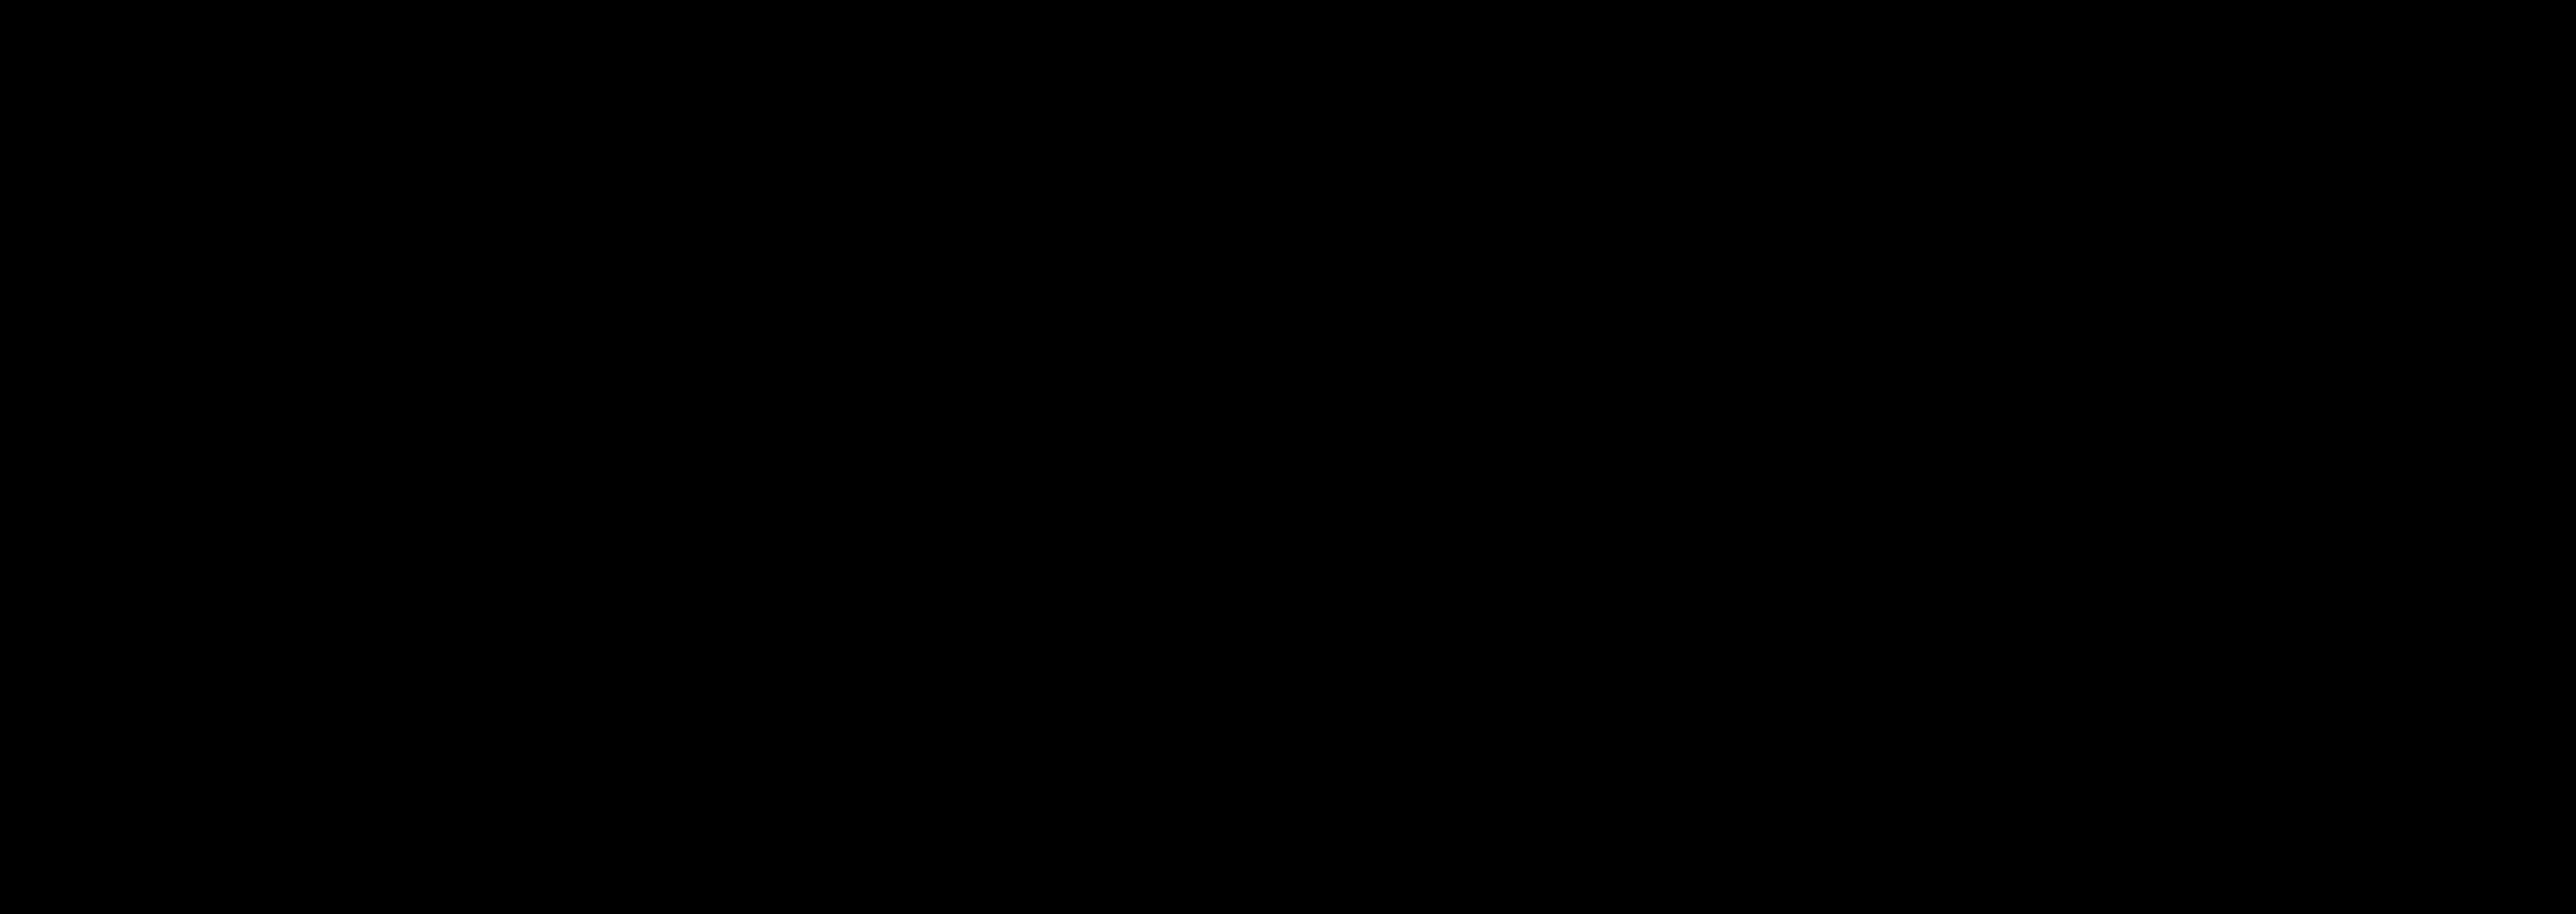 7 Scissors Drawing Png Transparent Onlygfx Com